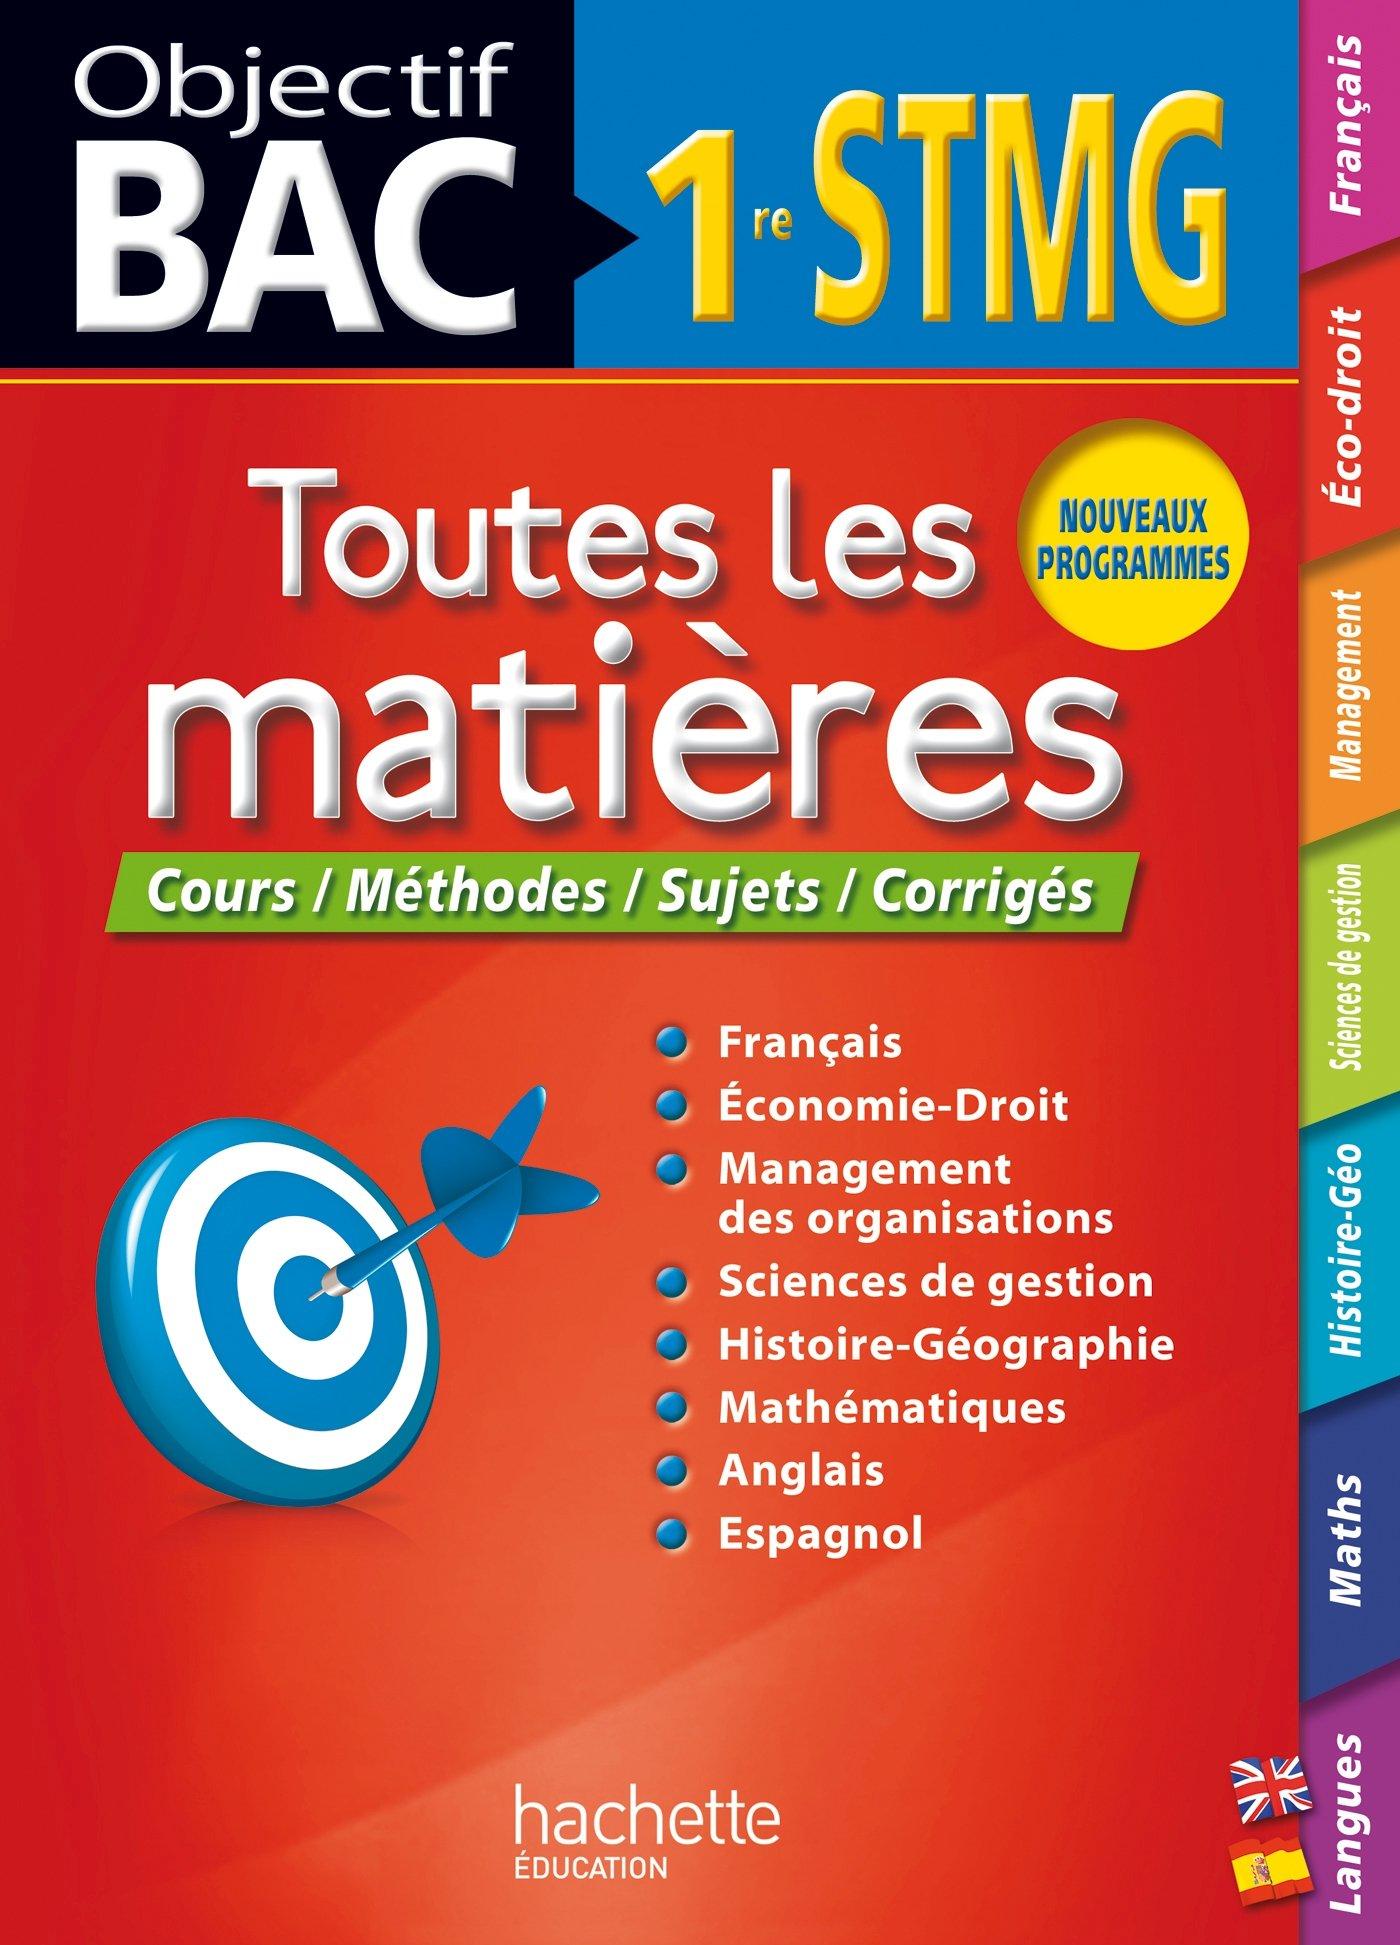 Objectif Bac Toutes les matières 1re STMG: Amazon.es: Collectif: Libros en idiomas extranjeros